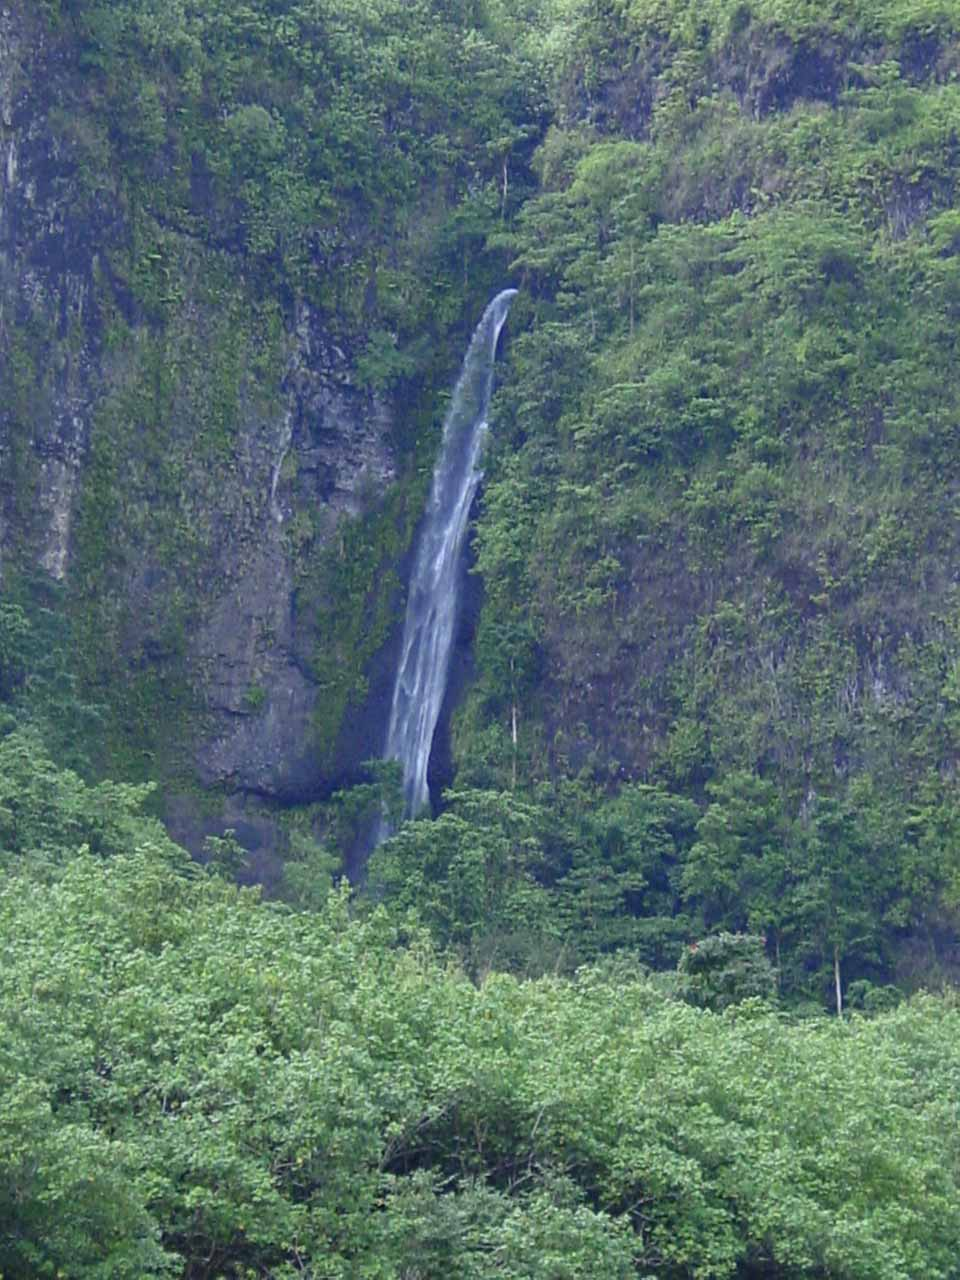 Closeup of the Topatari Waterfall